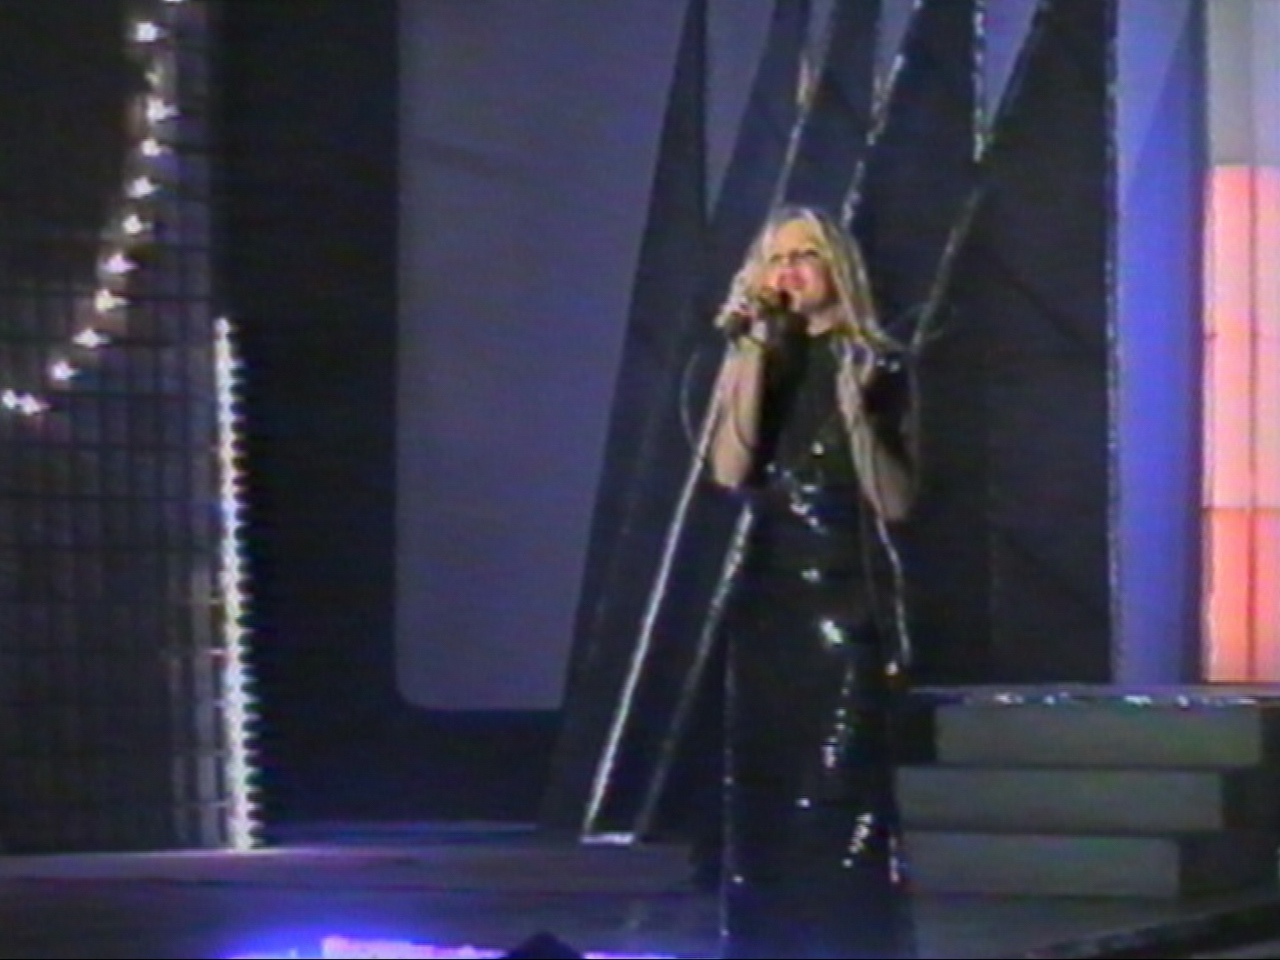 Amara 1994 - MadalinaGhica.jpg